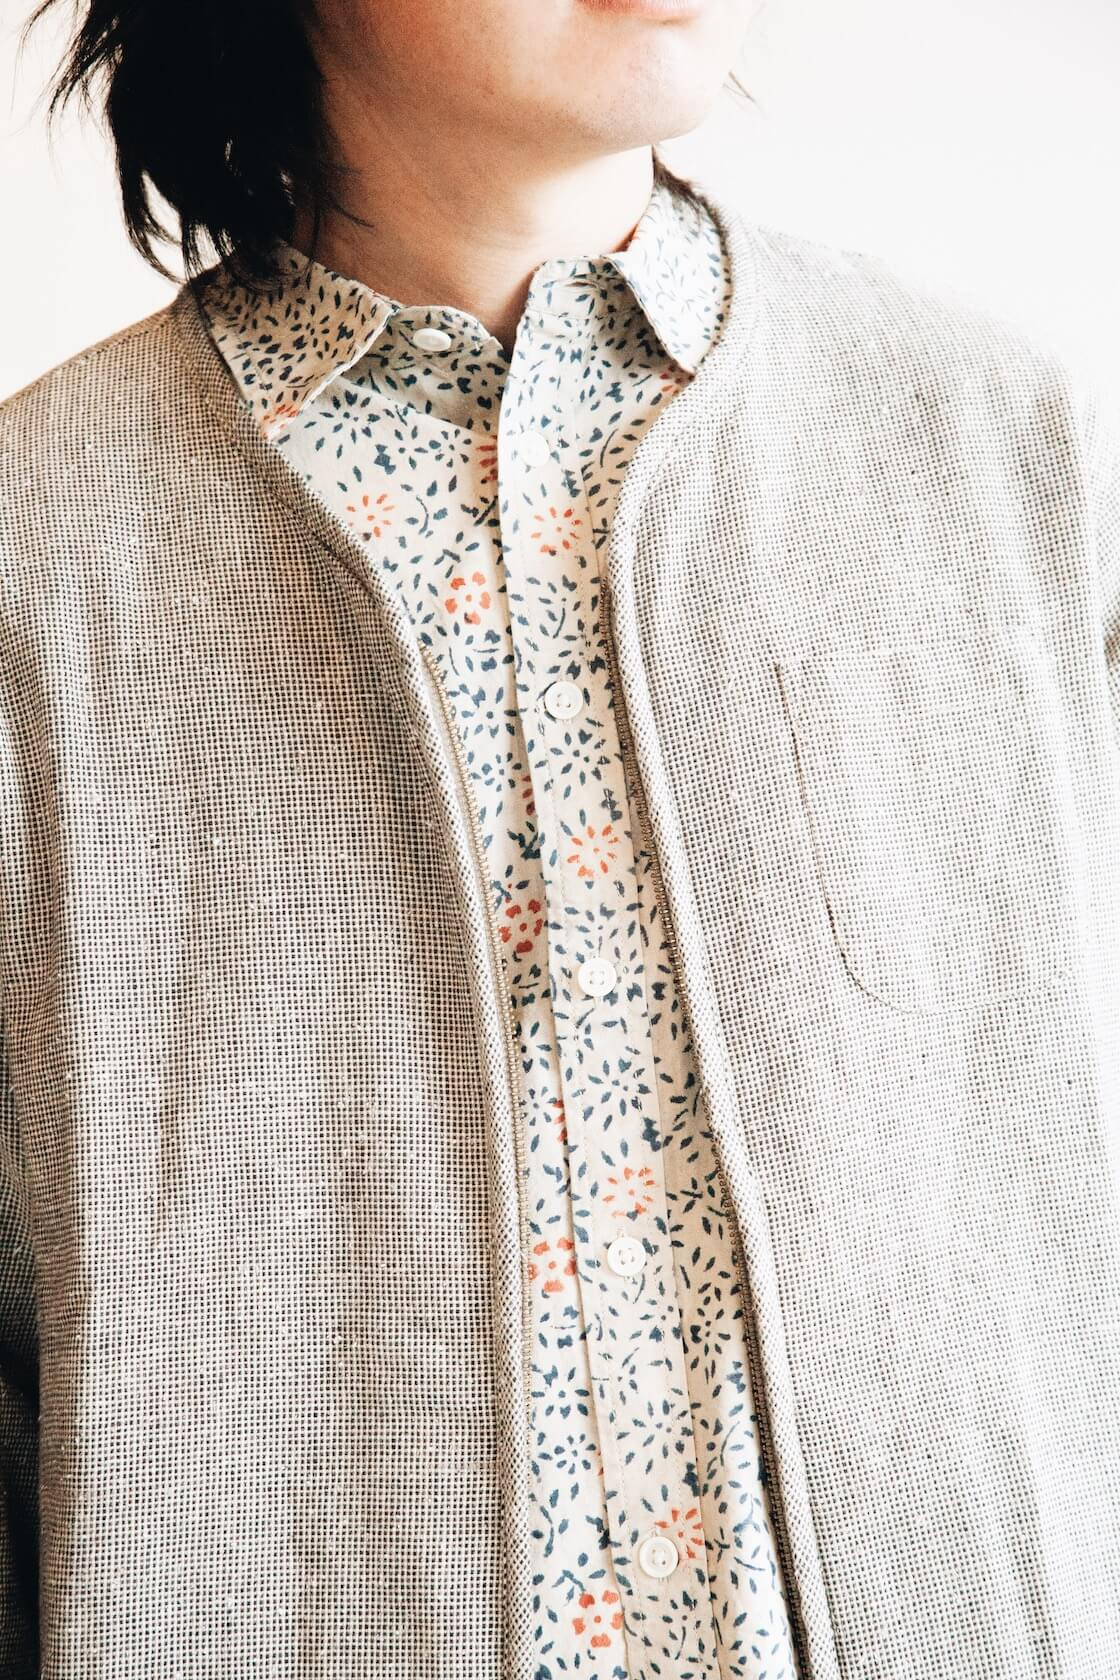 Collarless Jacket from Corridor, Natural Handblock Floral shirt from Corridor on body